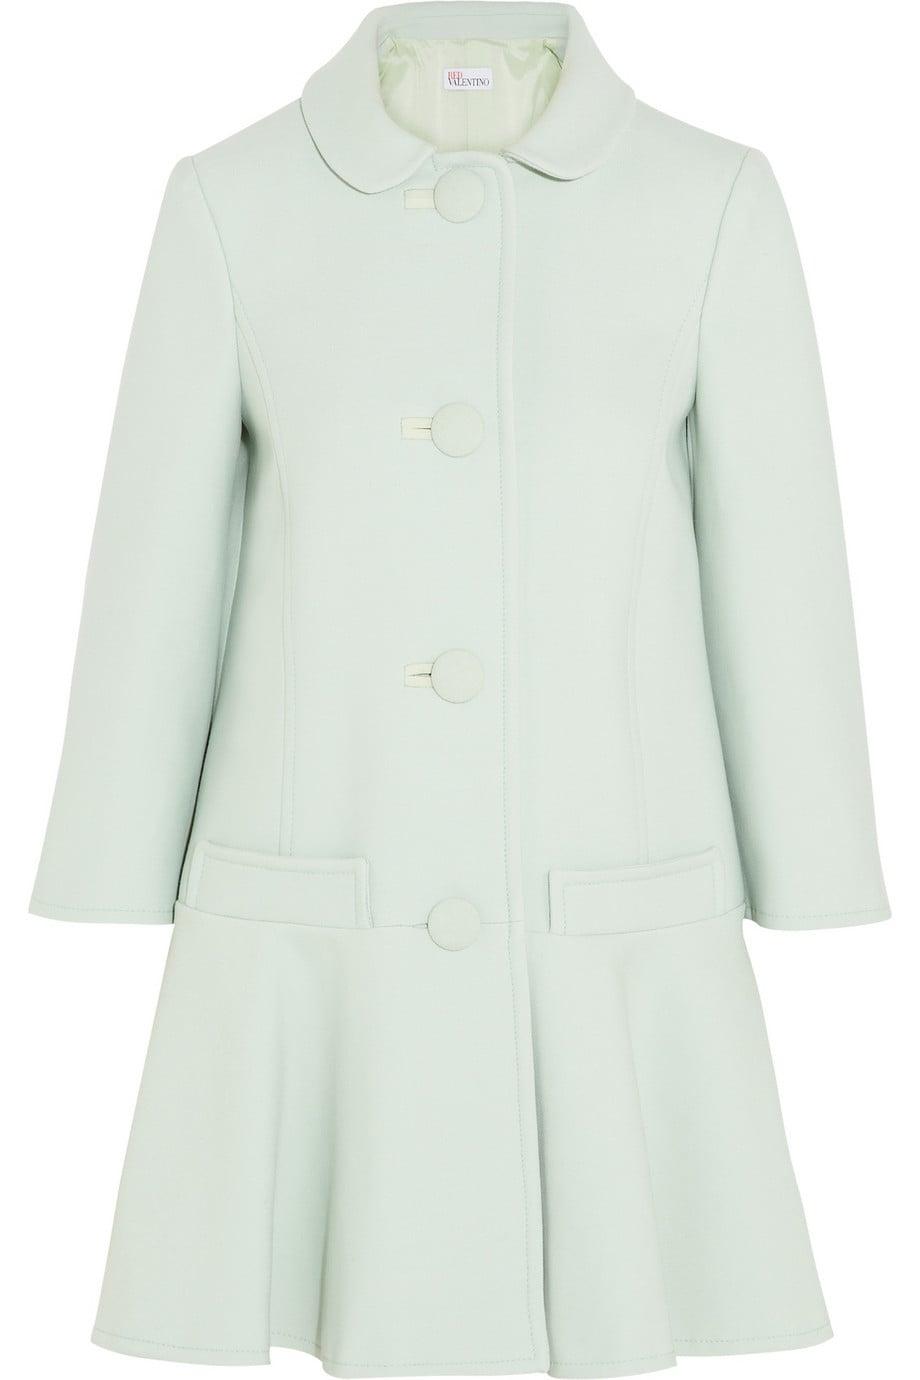 Red Valentino mint-green coat ($995)